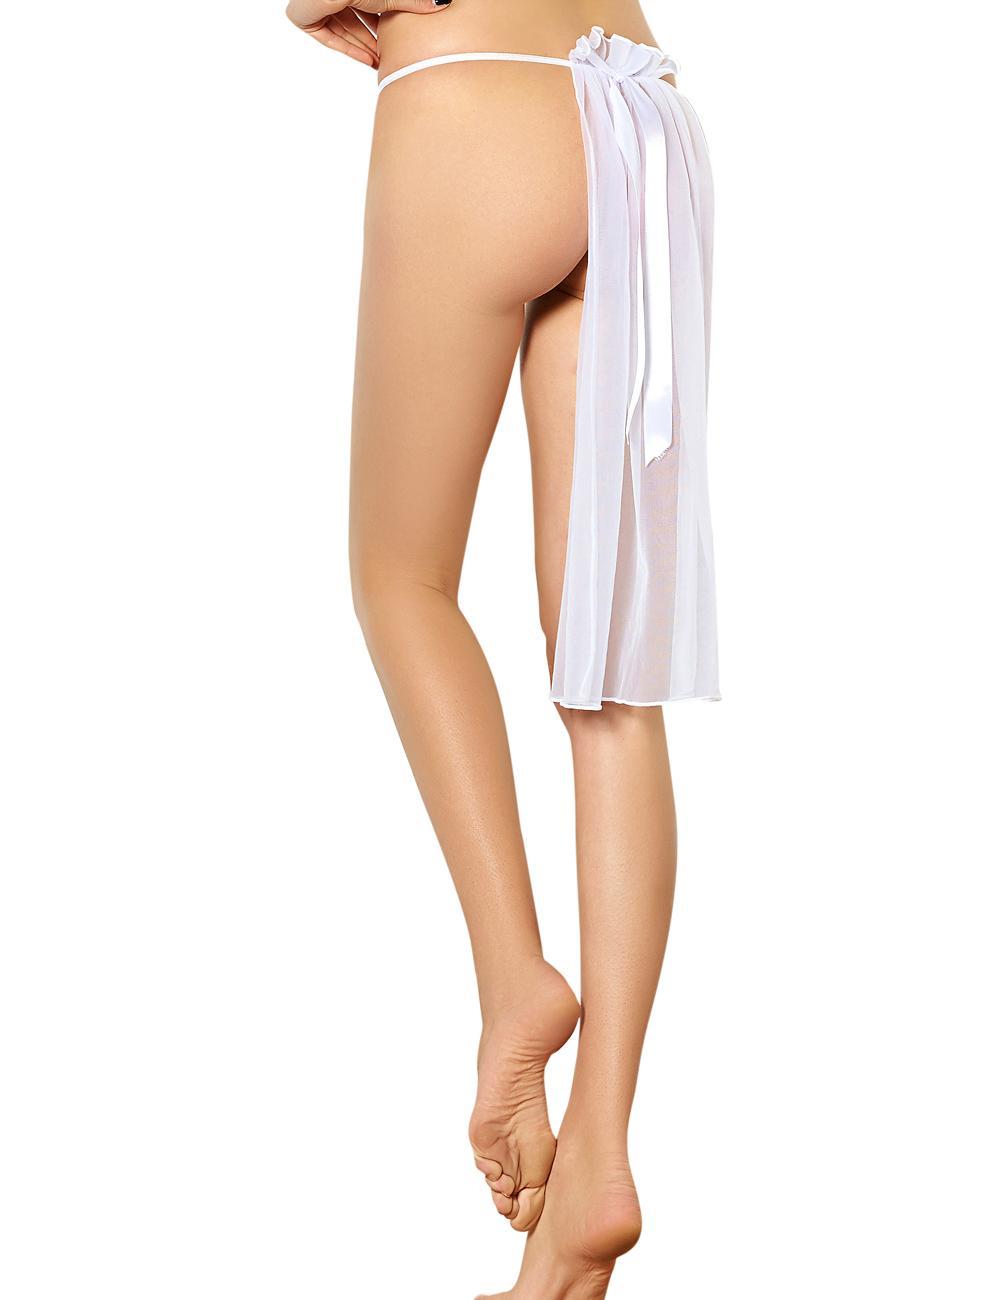 White lace sexy mature women underwear 3